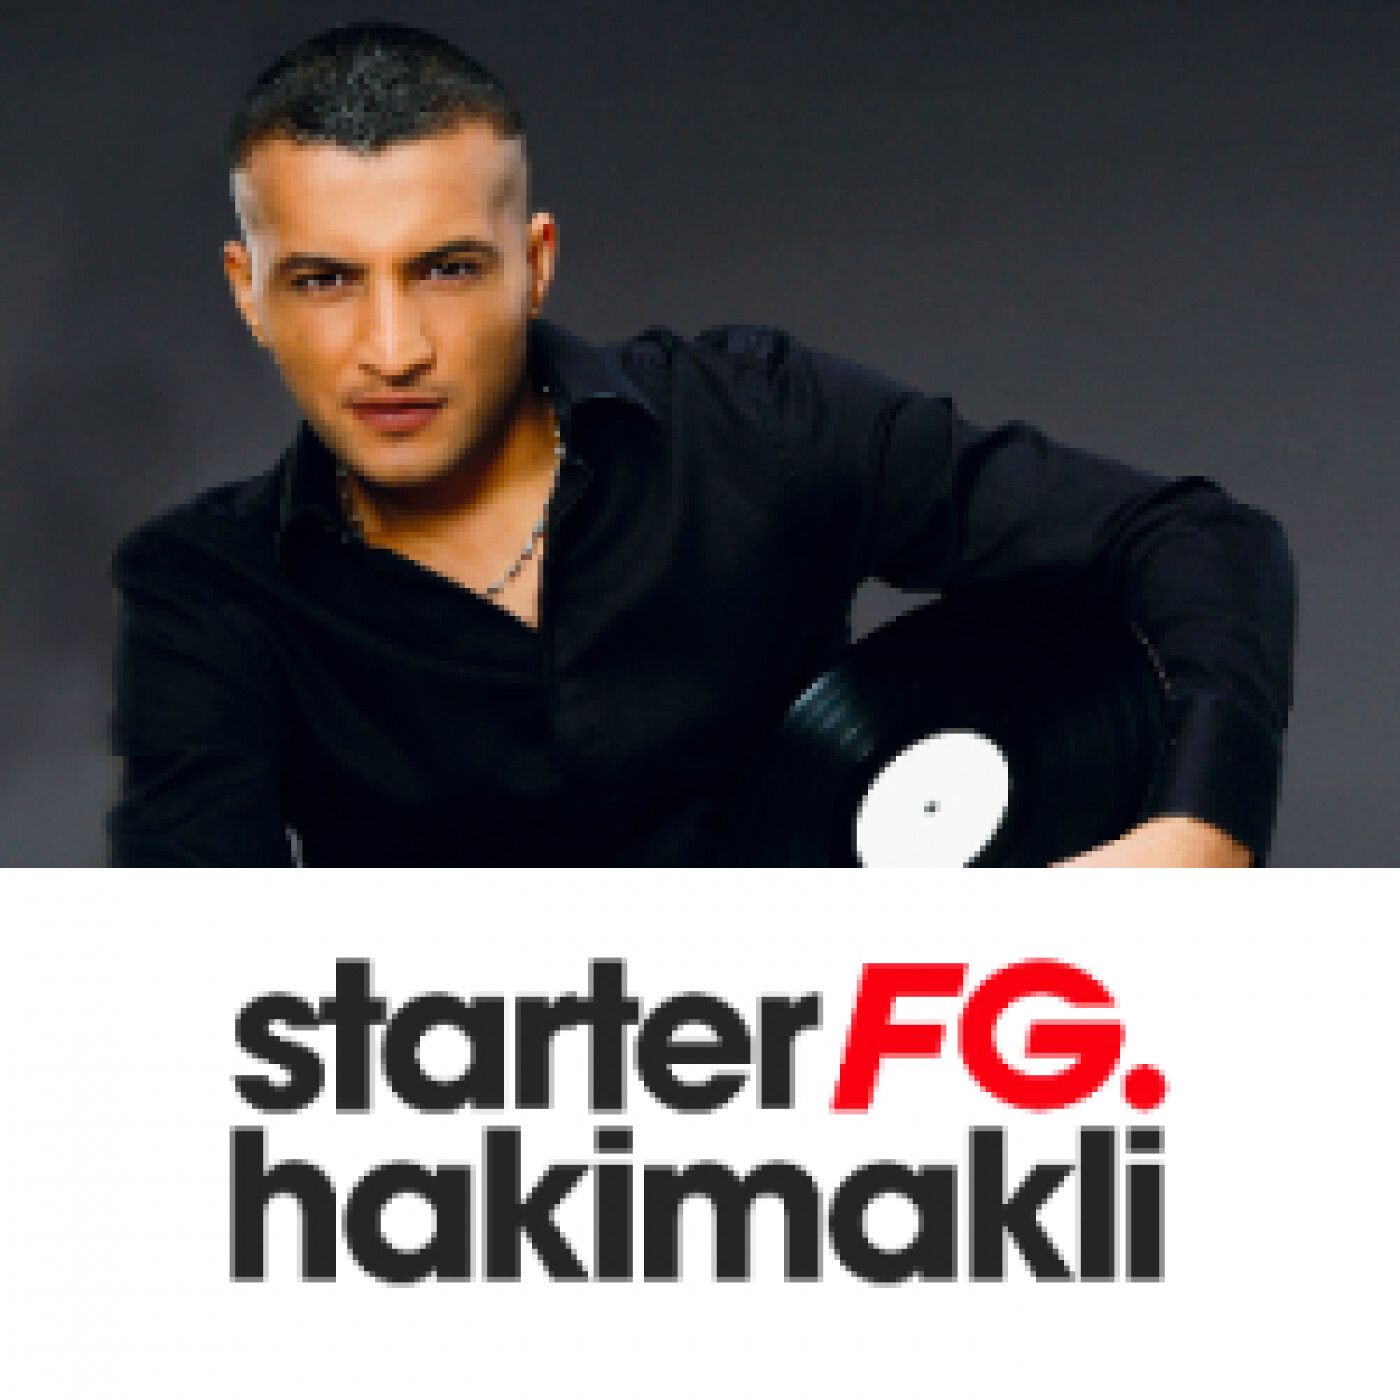 STARTER FG BY HAKIMAKLI MARDI 8 JUIN 2021